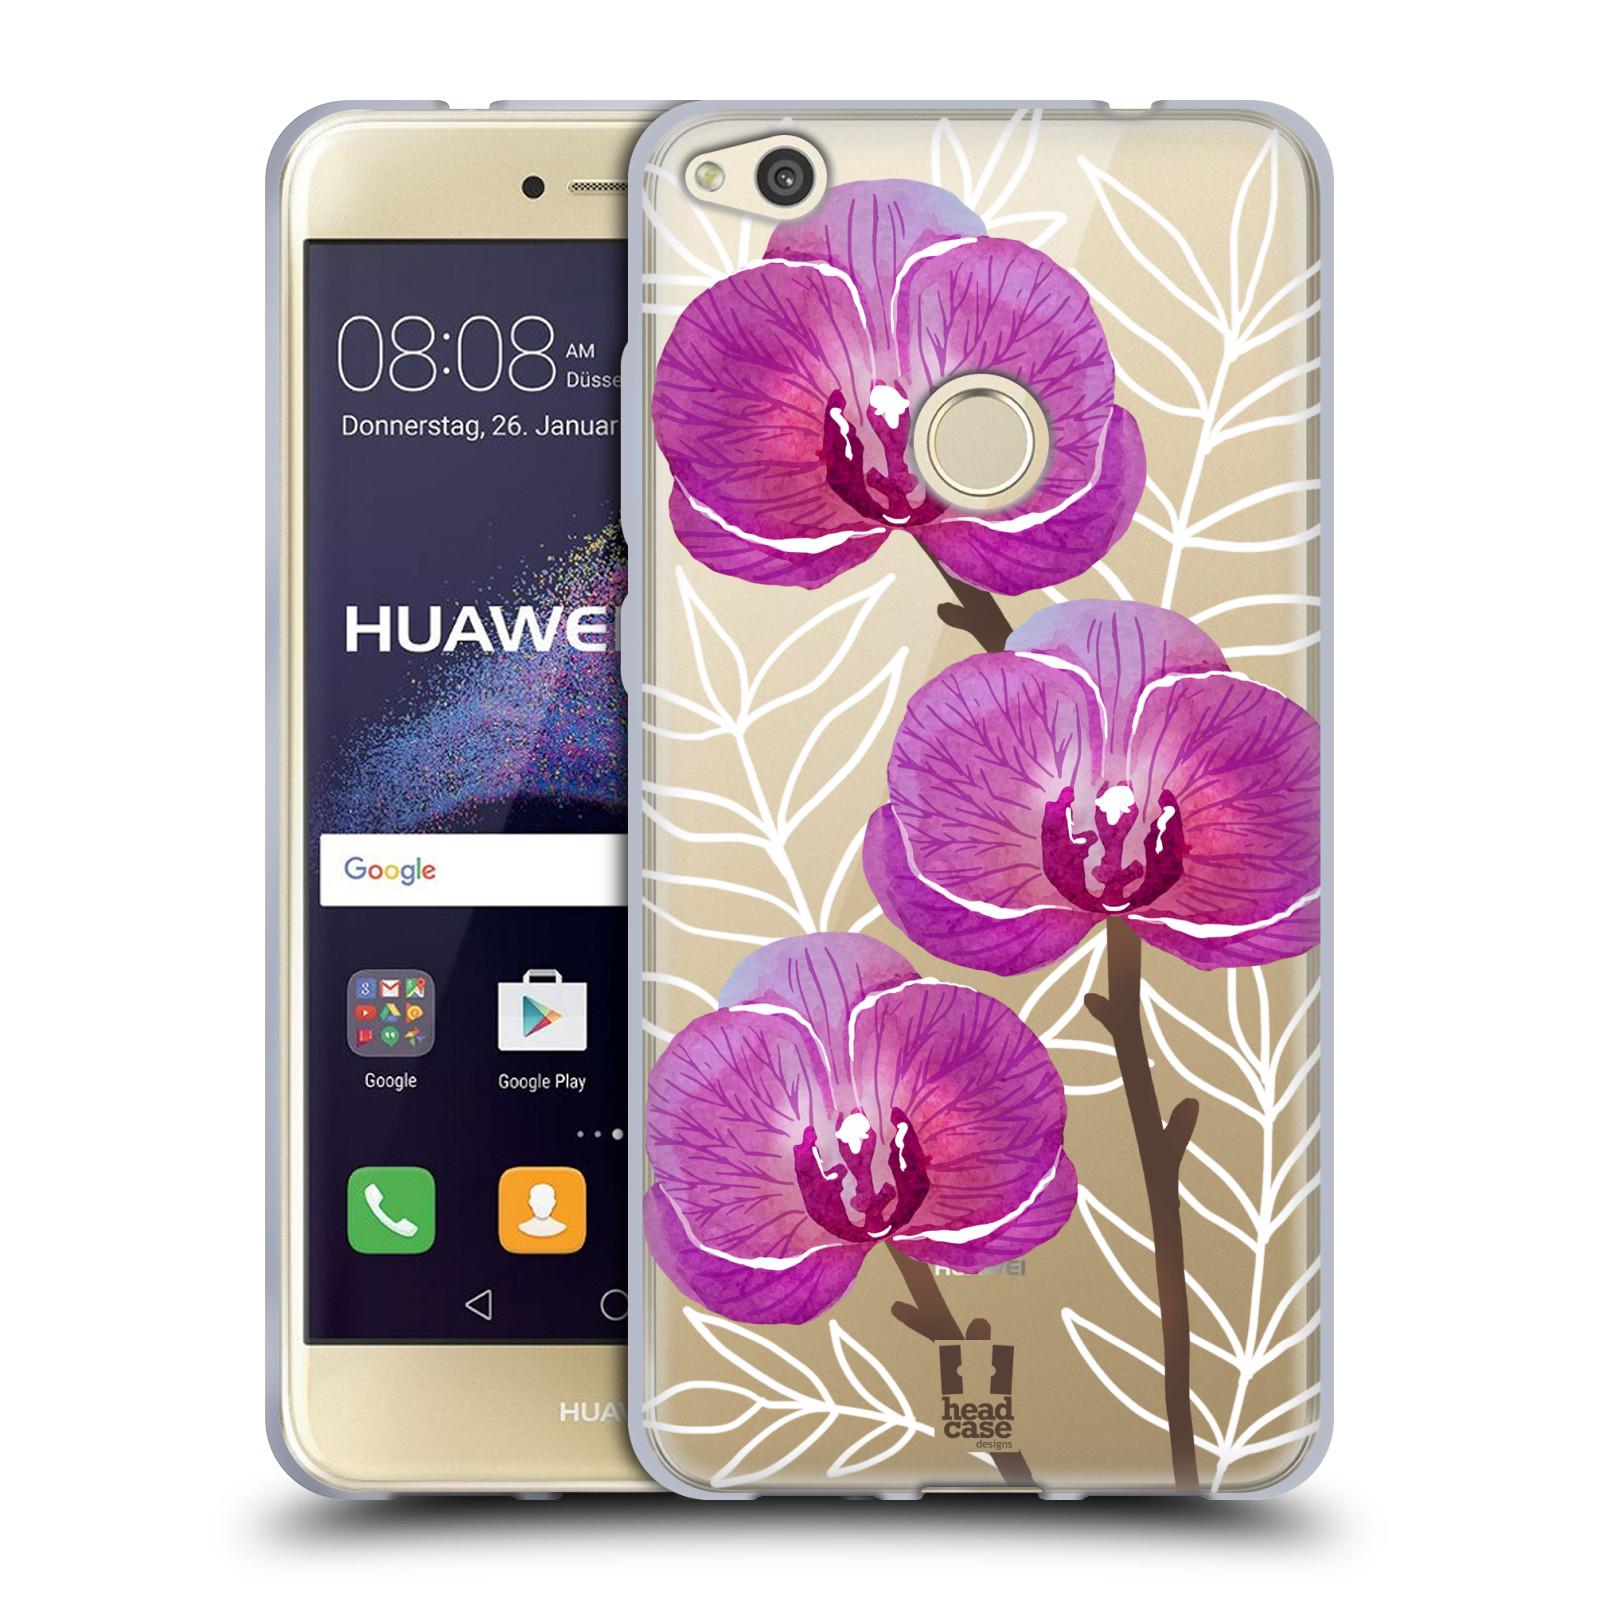 Silikonové pouzdro na mobil Huawei P9 Lite (2017) - Head Case - Hezoučké kvítky - průhledné